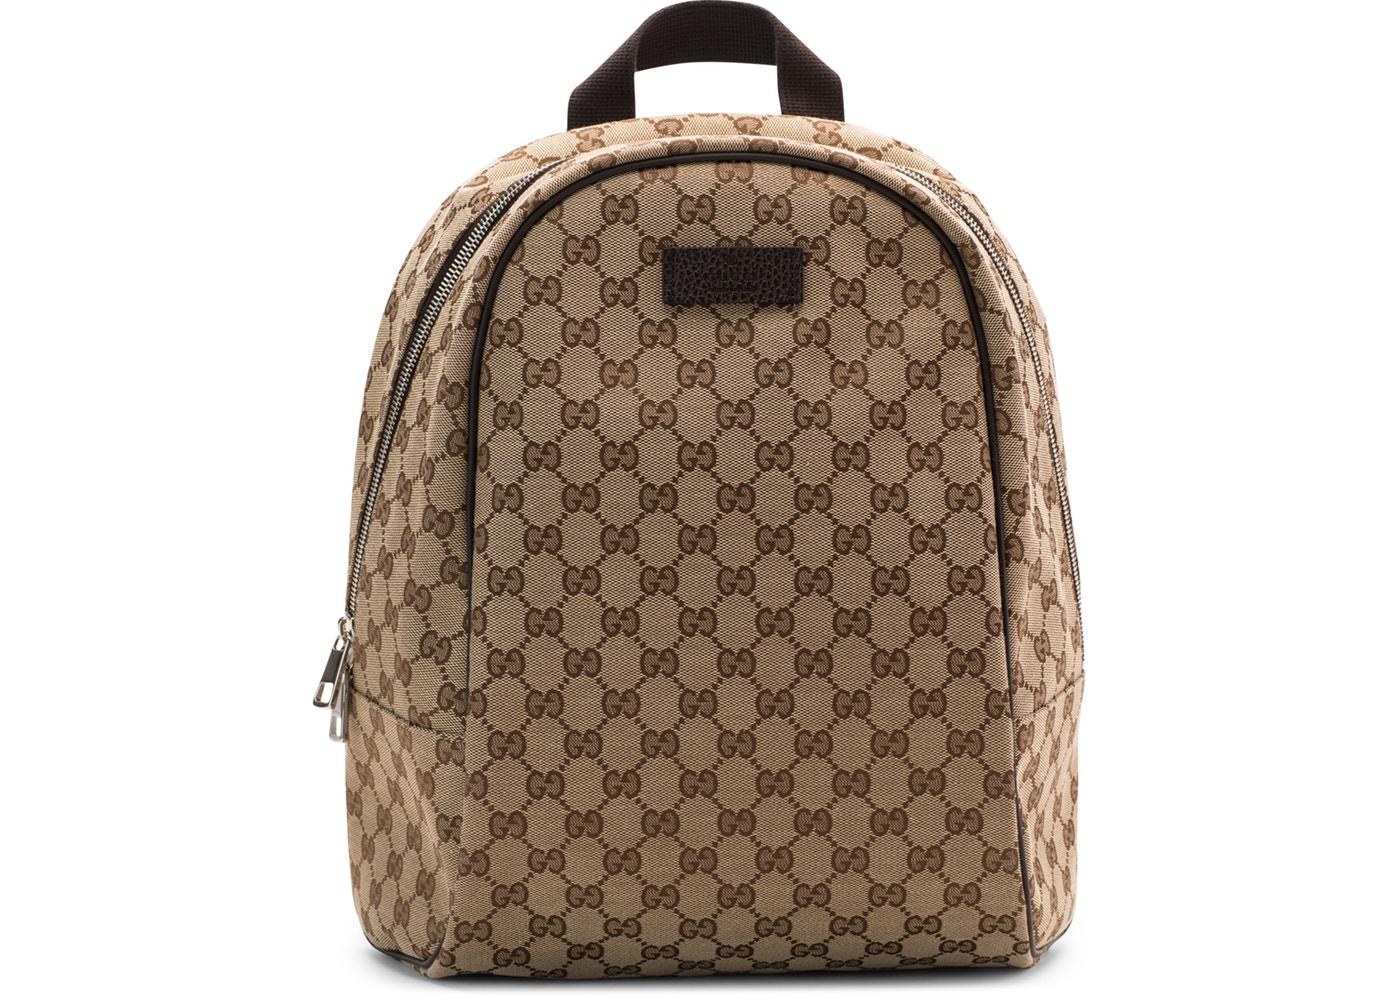 665c737dc Gucci Monogram Supreme Canvas Zipper Top Backpack | HEWI London